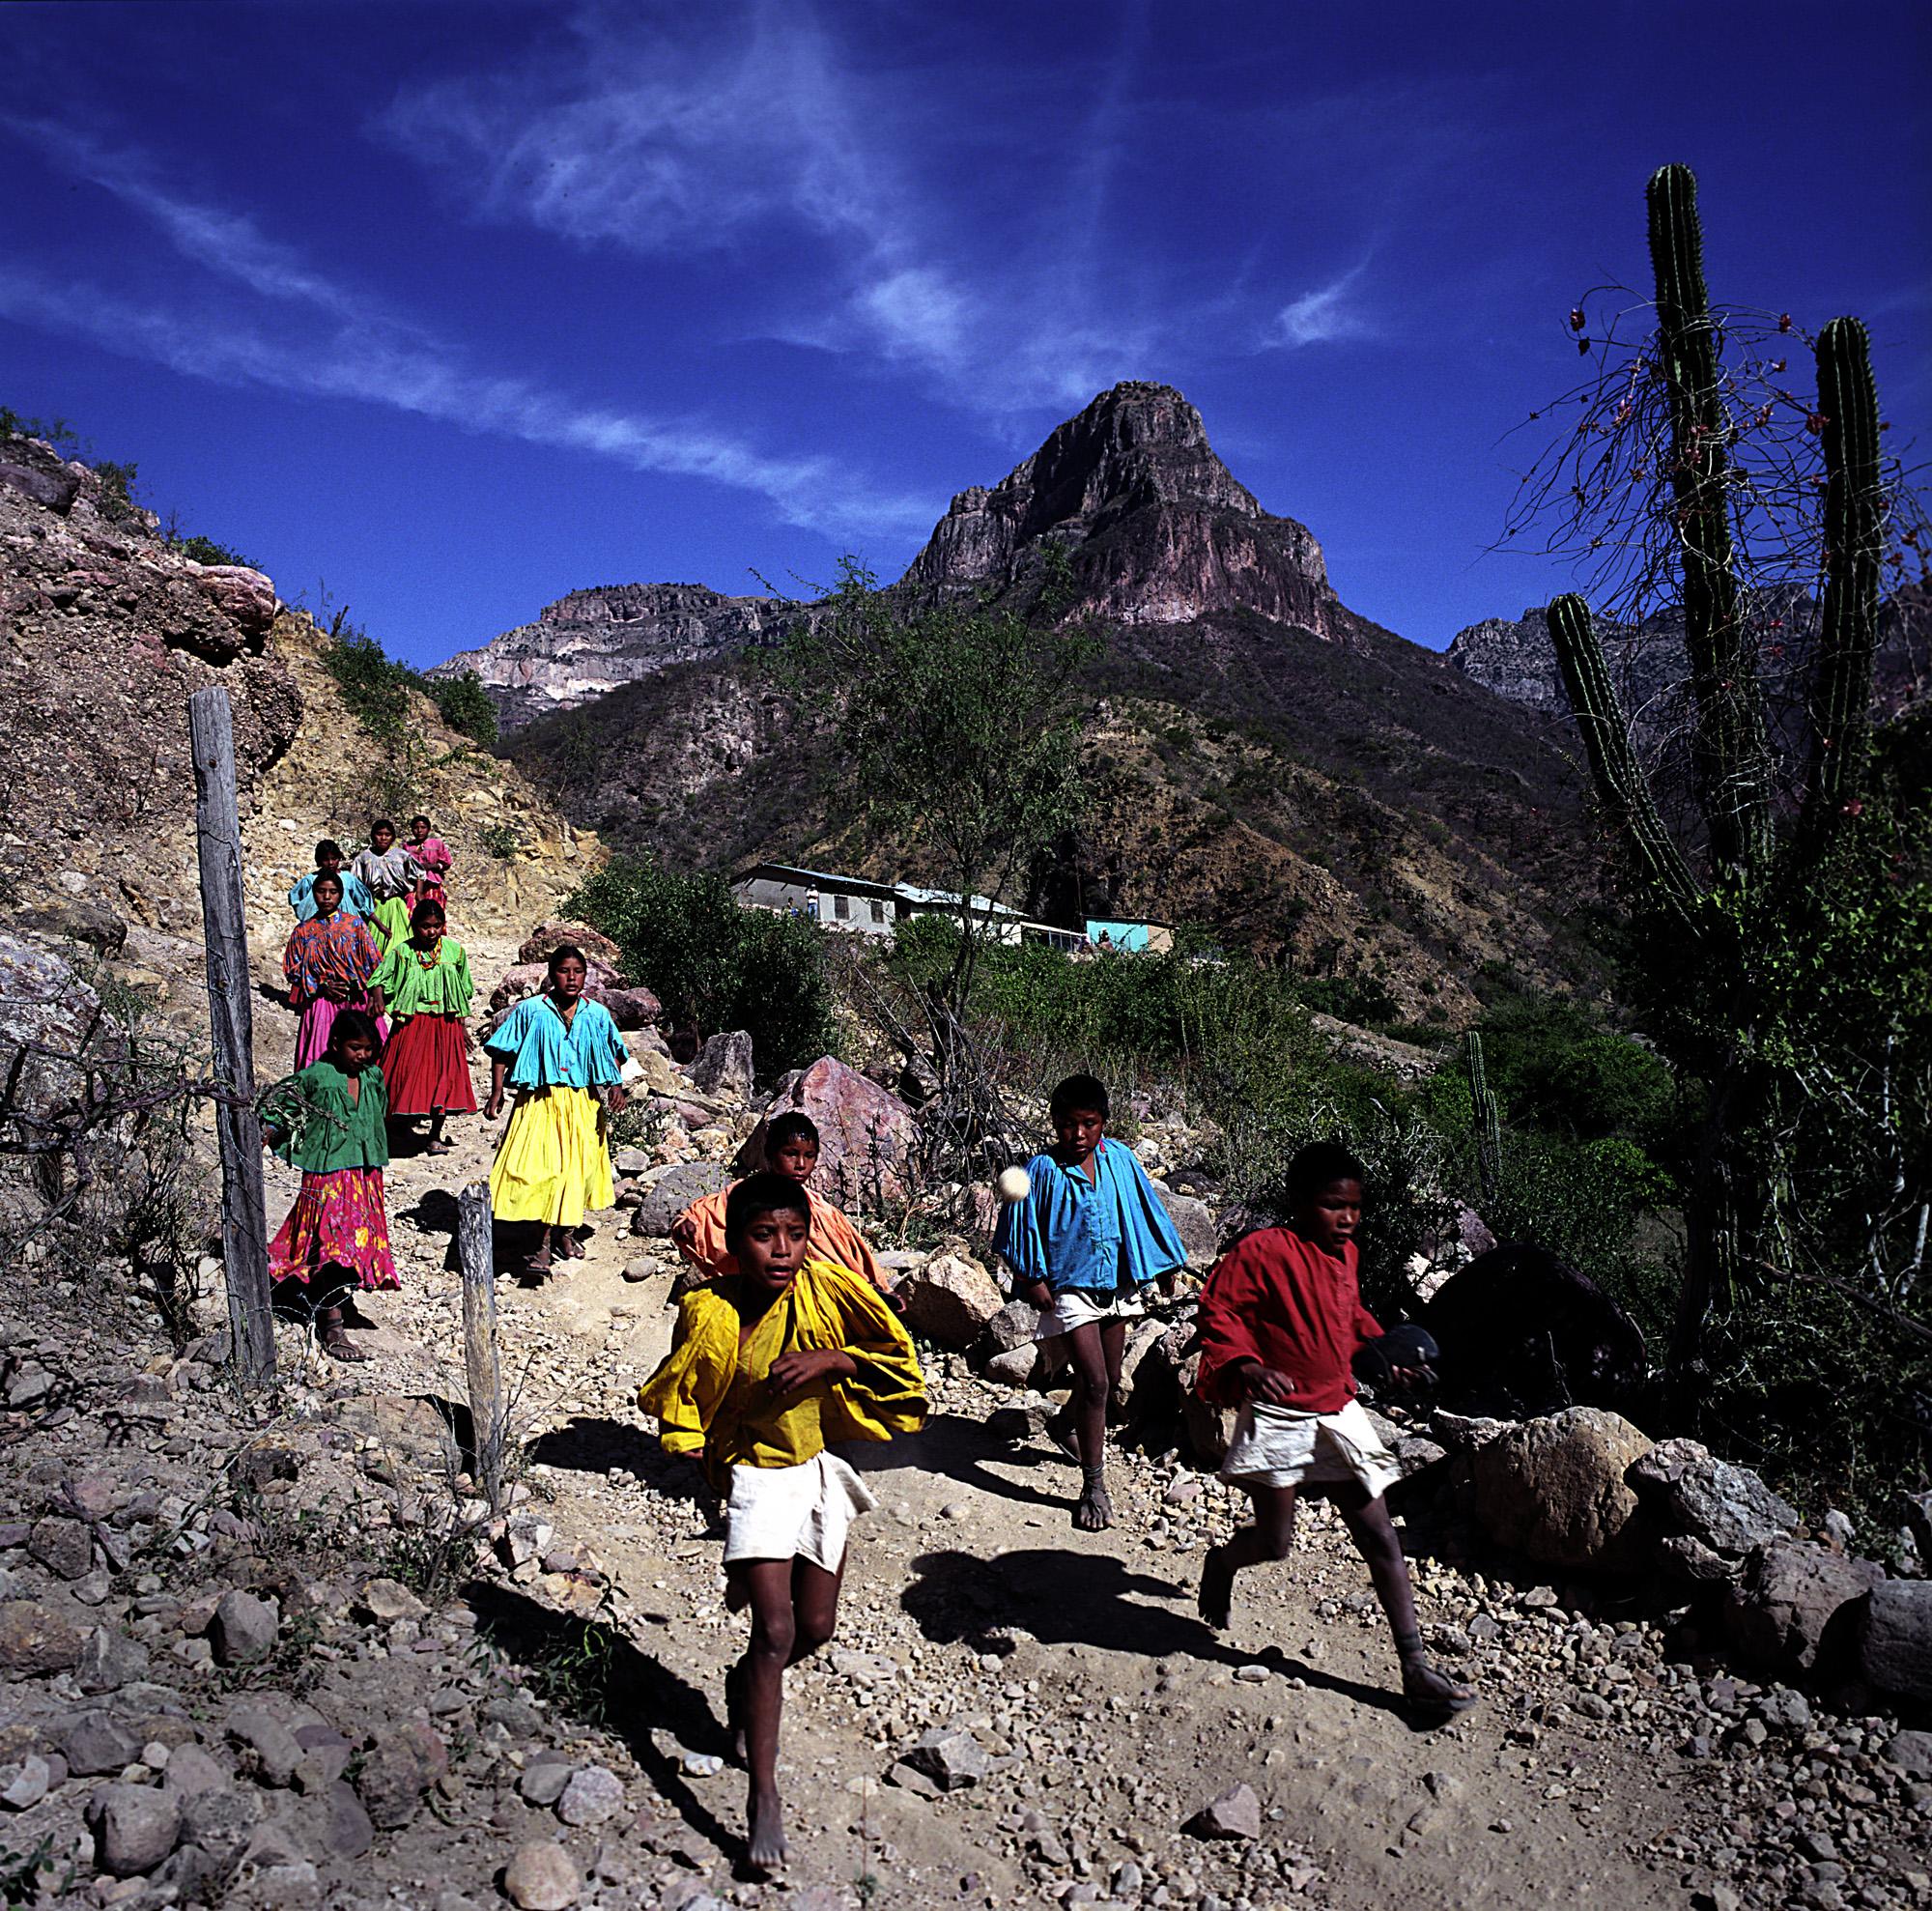 The Tarahumara